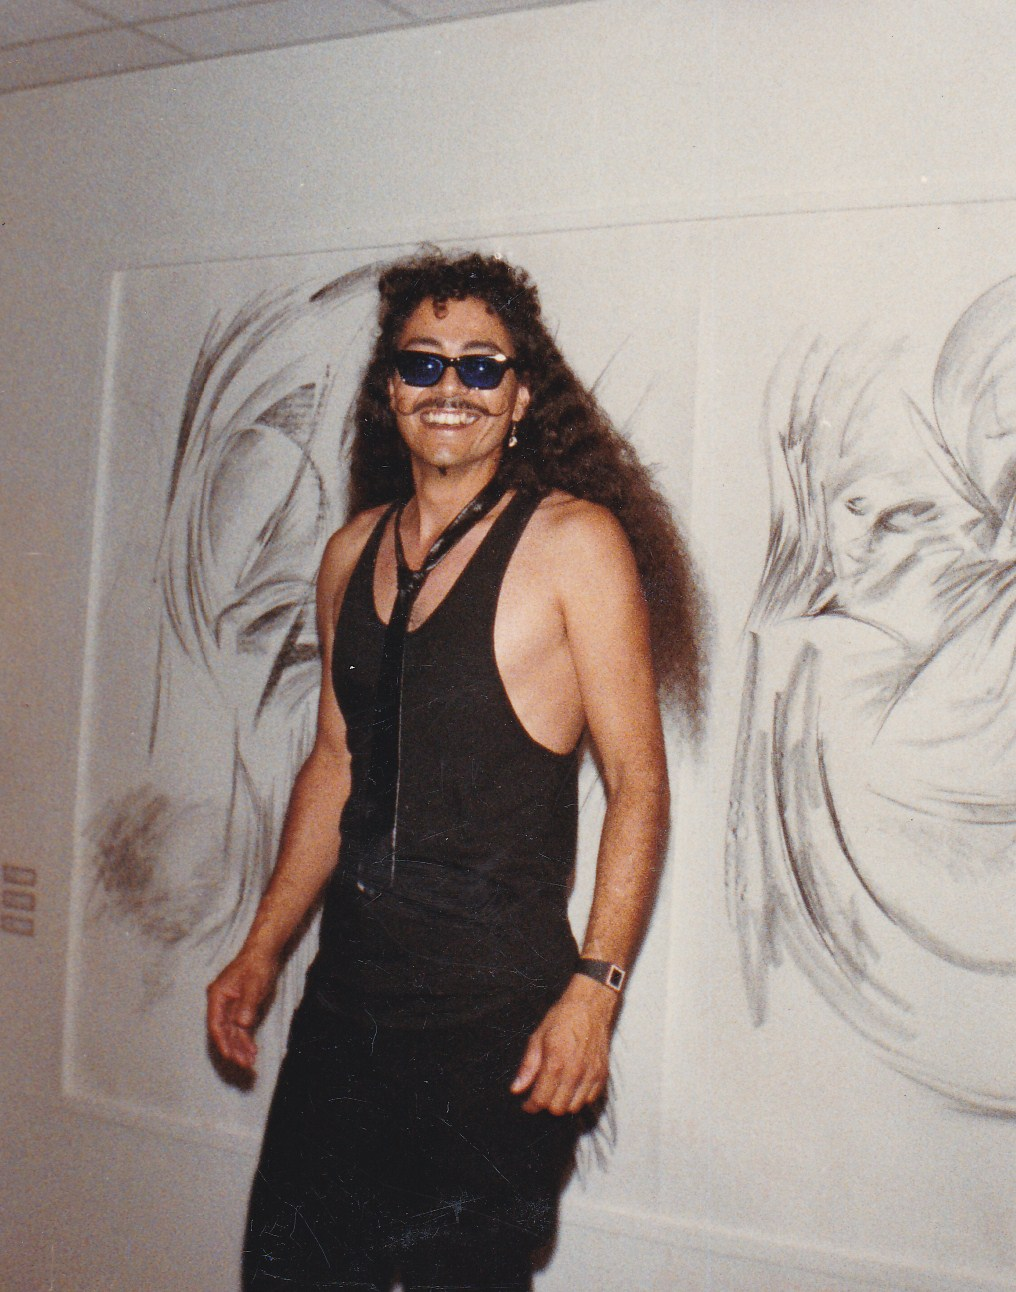 1986 mars gallery show.jpg